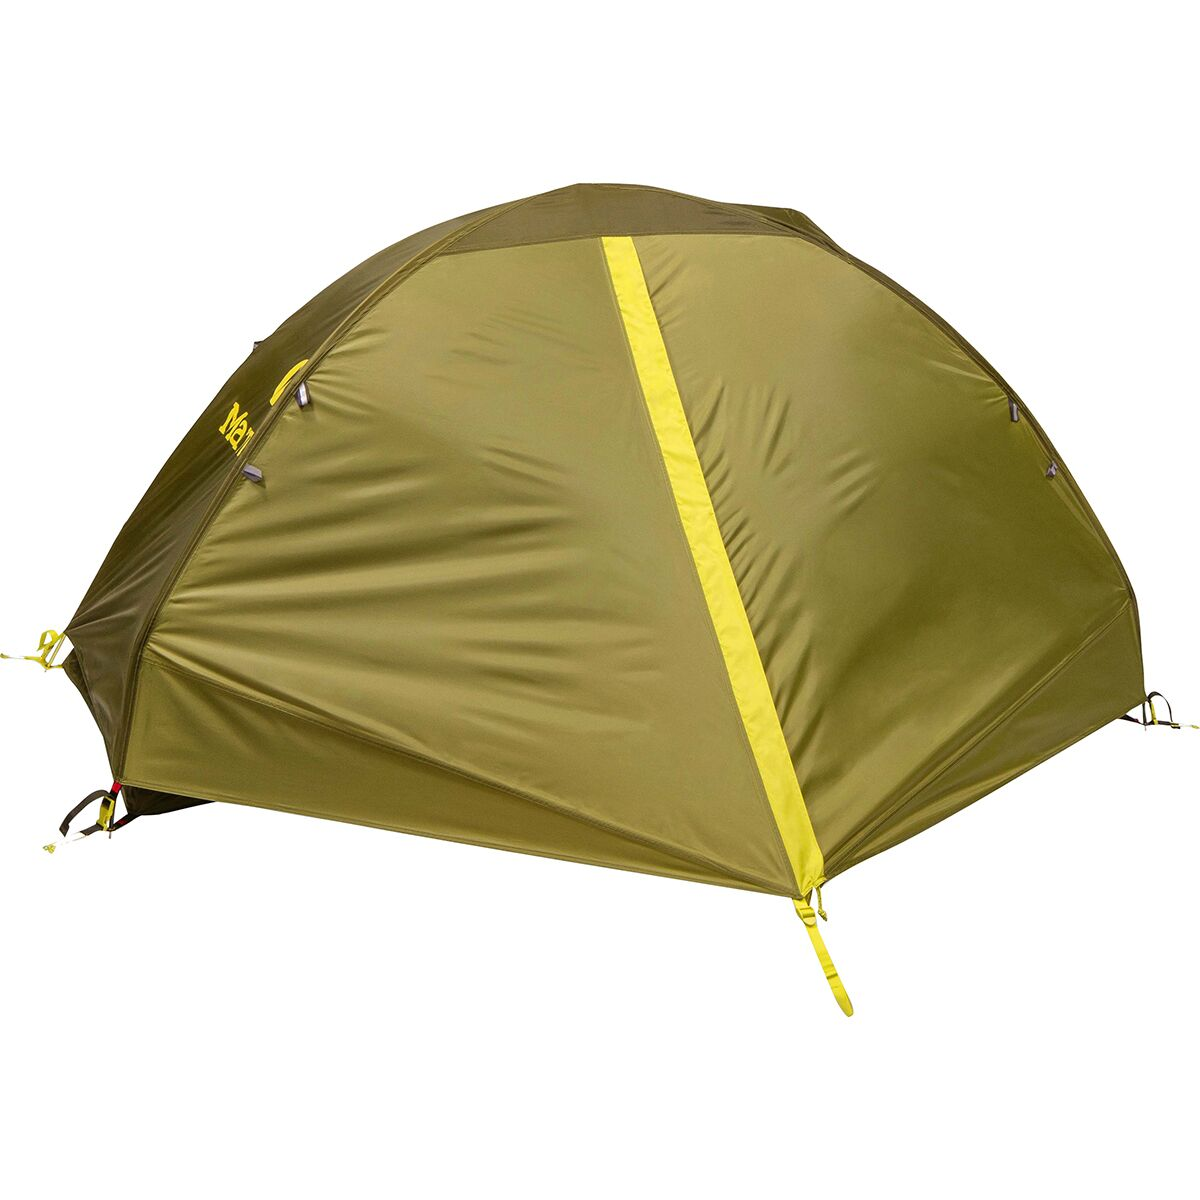 Marmot Tungsten Tent: 1-Person 3-Season Green Shadow/Moss, One Size